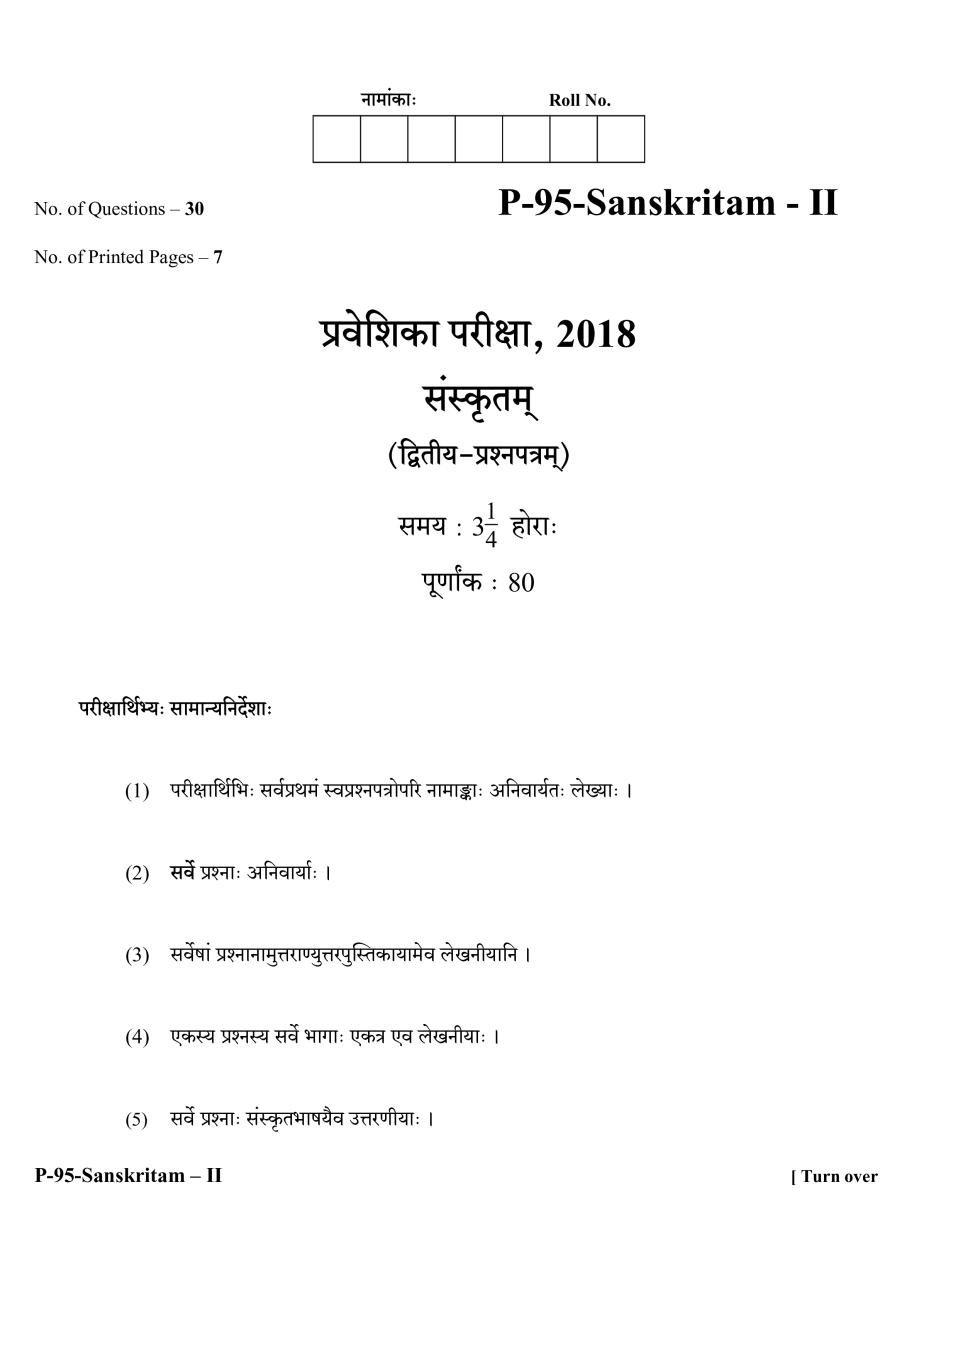 Rajasthan Board Praveshika Sanskrit II Question Paper 2018 - Page 1